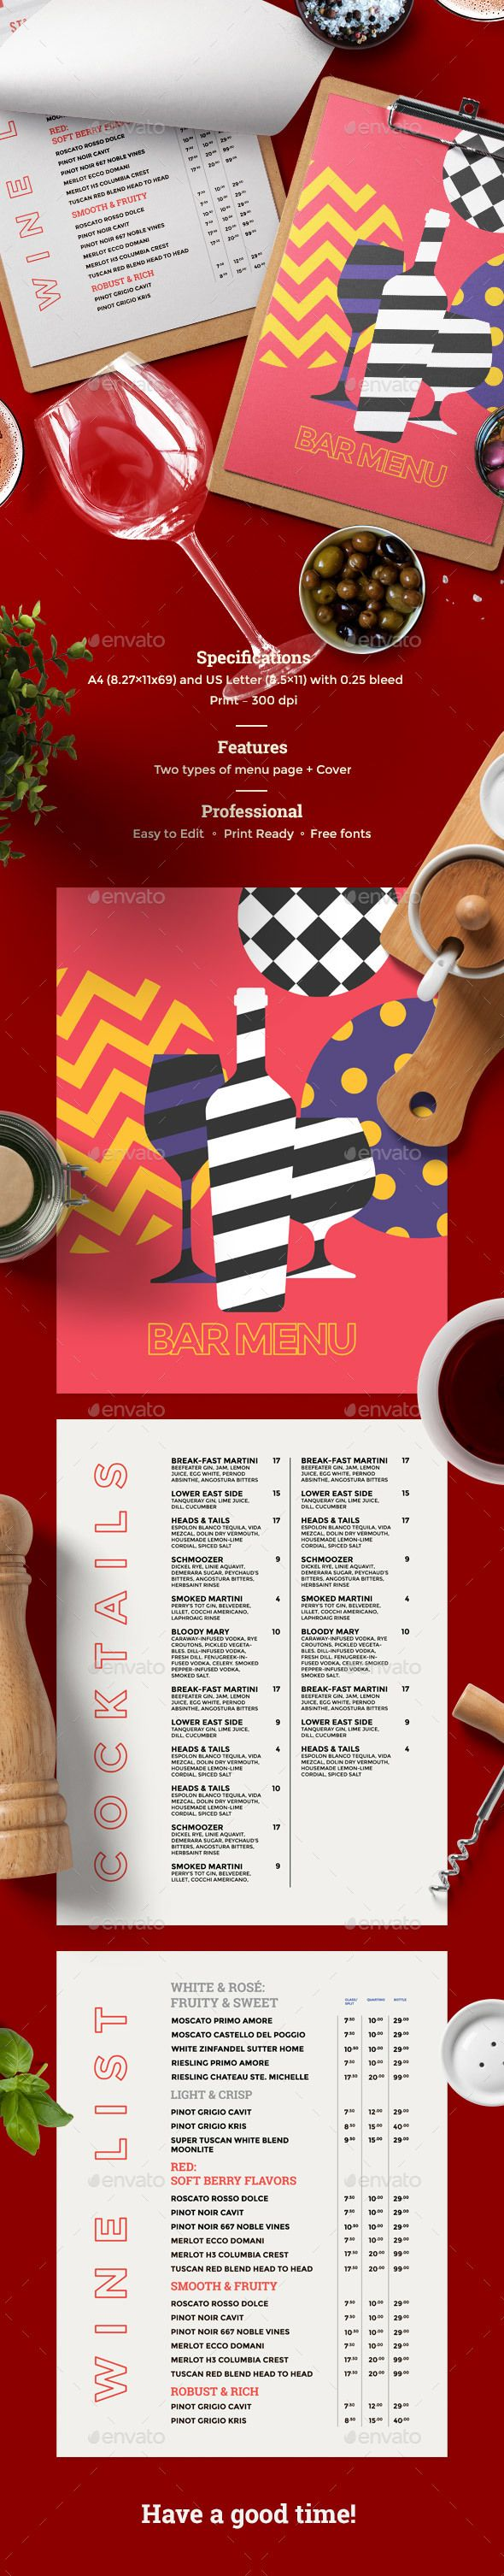 11763 best Graphic design | food & drink etc. images on Pinterest ...